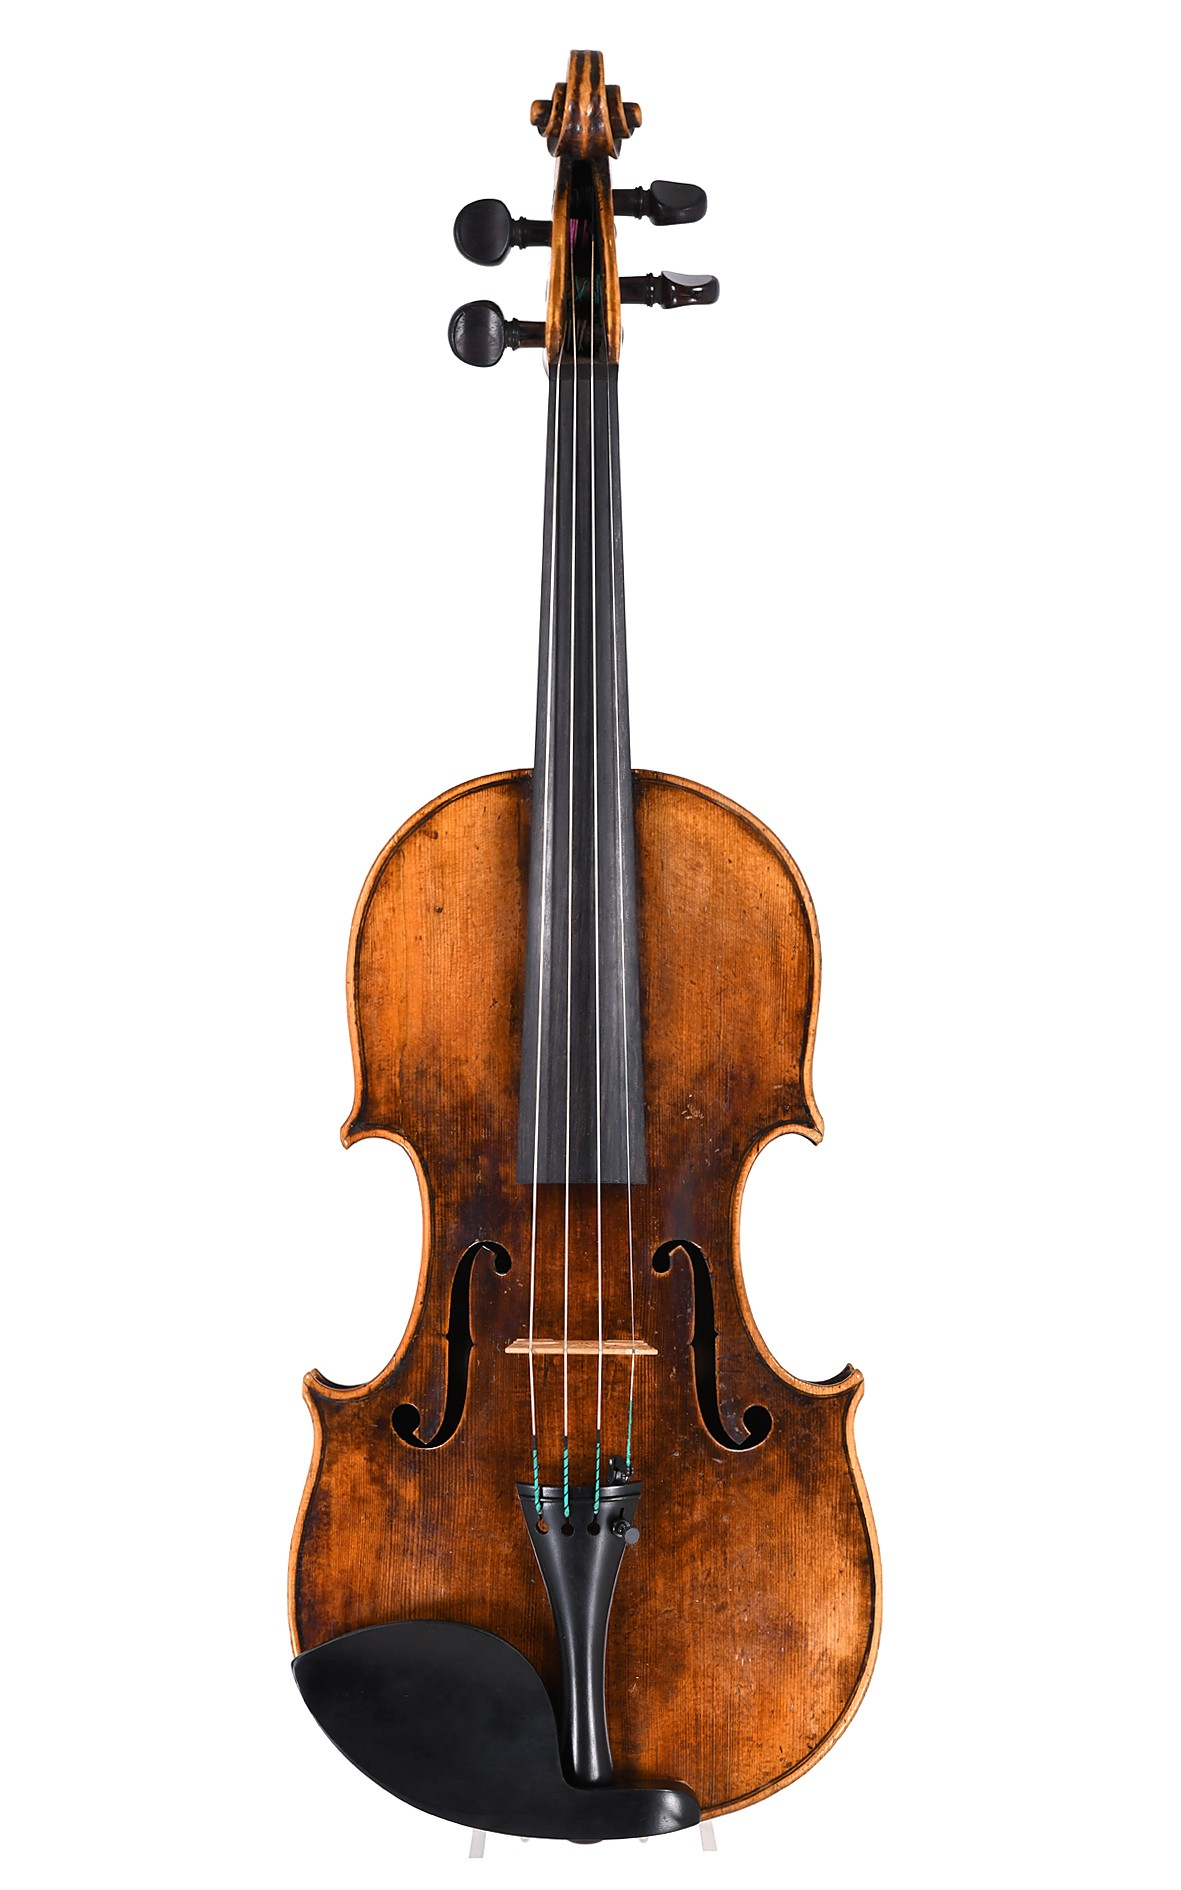 Master violin, Bavaria approx. 1800 - table